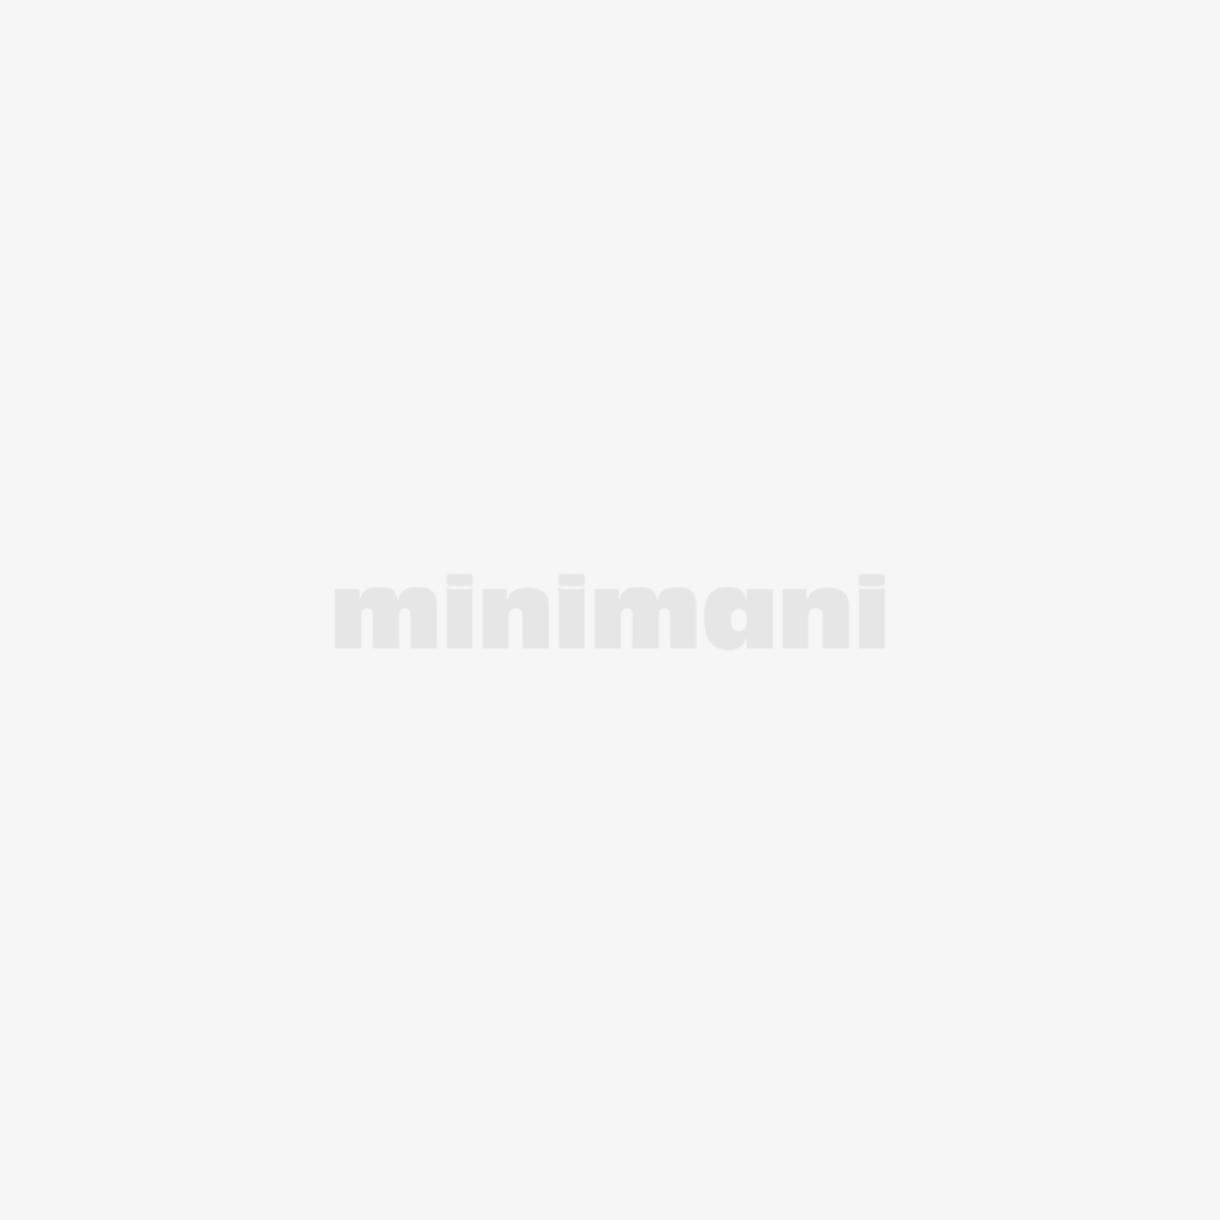 BIOCOMB ULKOTEKSTIILIEN HOMEENPOISTO-/ESTO 500 ML